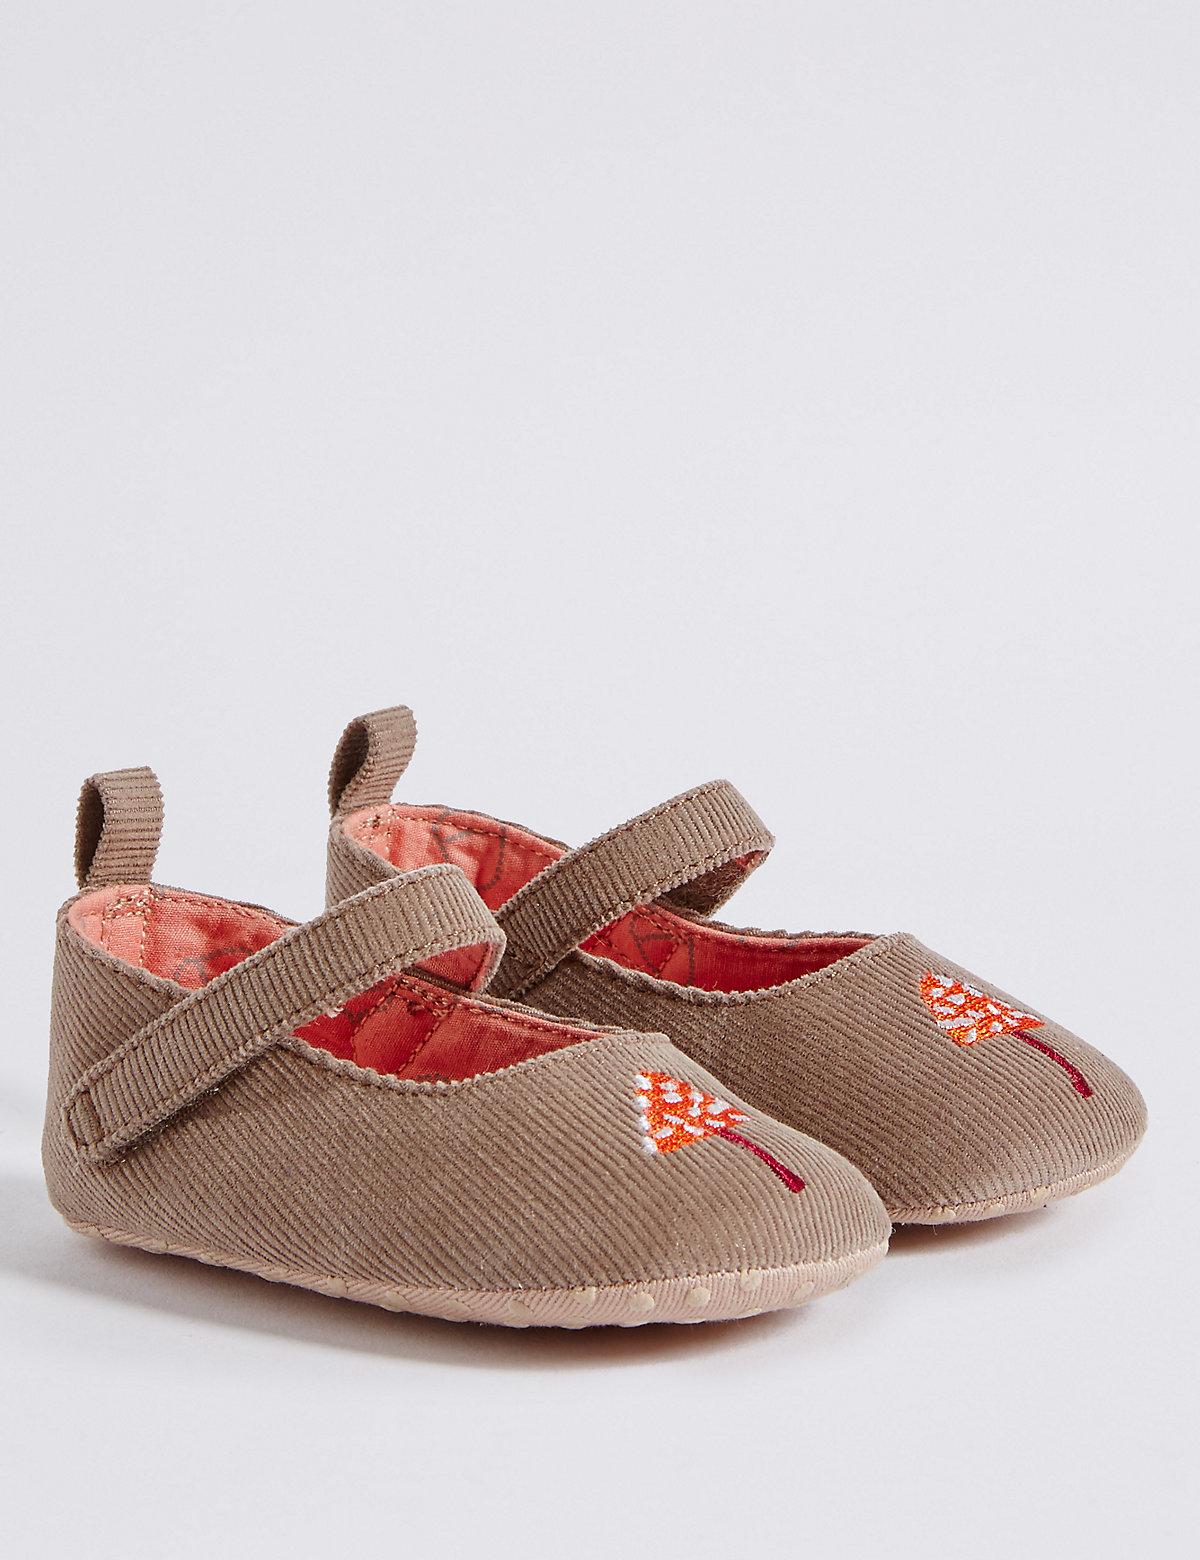 Baby Cross Bar Riptape Pram Shoes